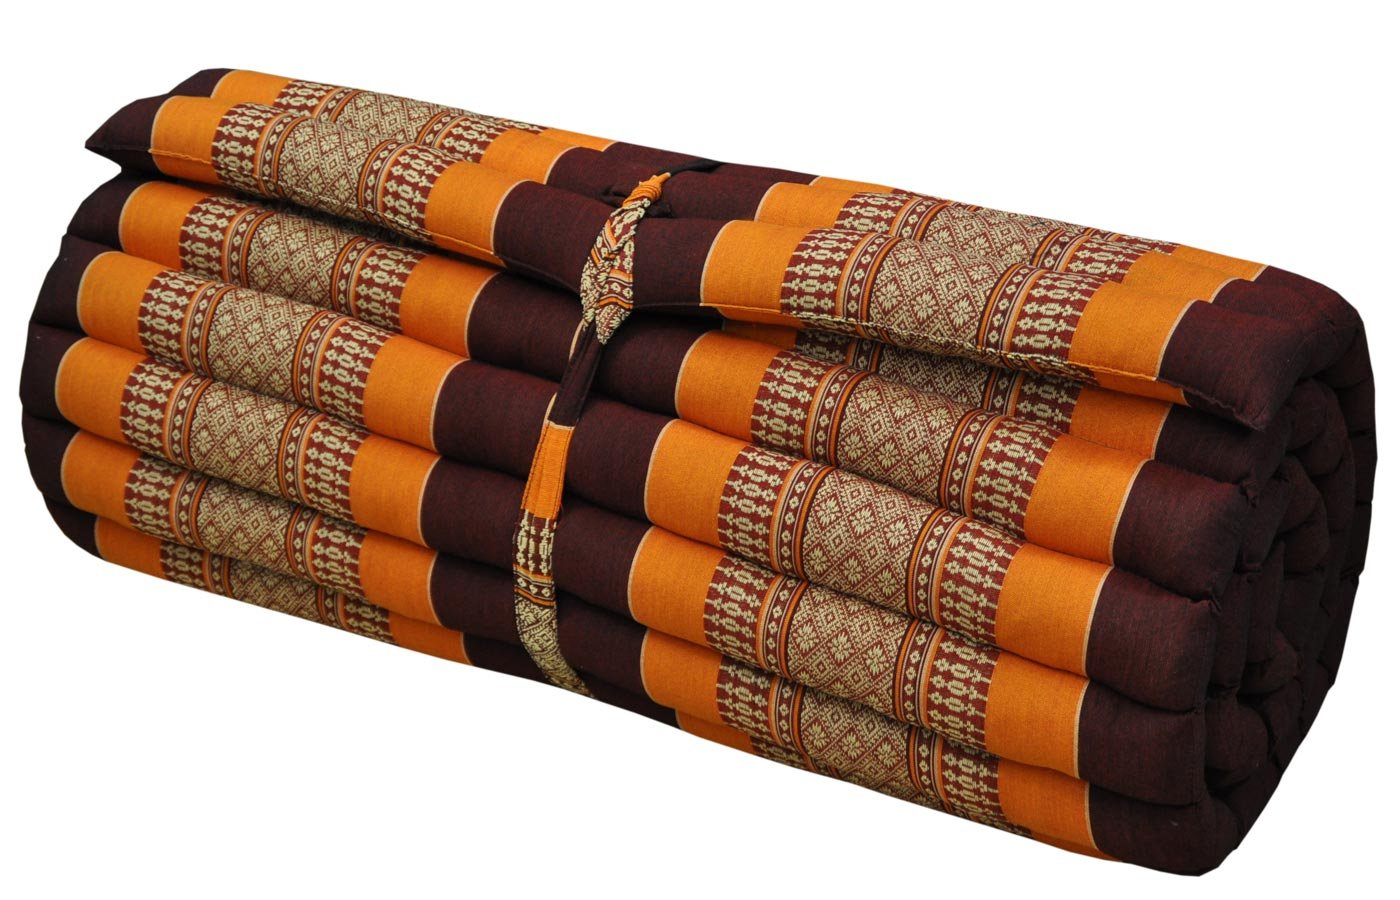 Thai mattress big size (75/180),brown/orange, relaxation, beach cushion, pool, meditation, yoga (81114)